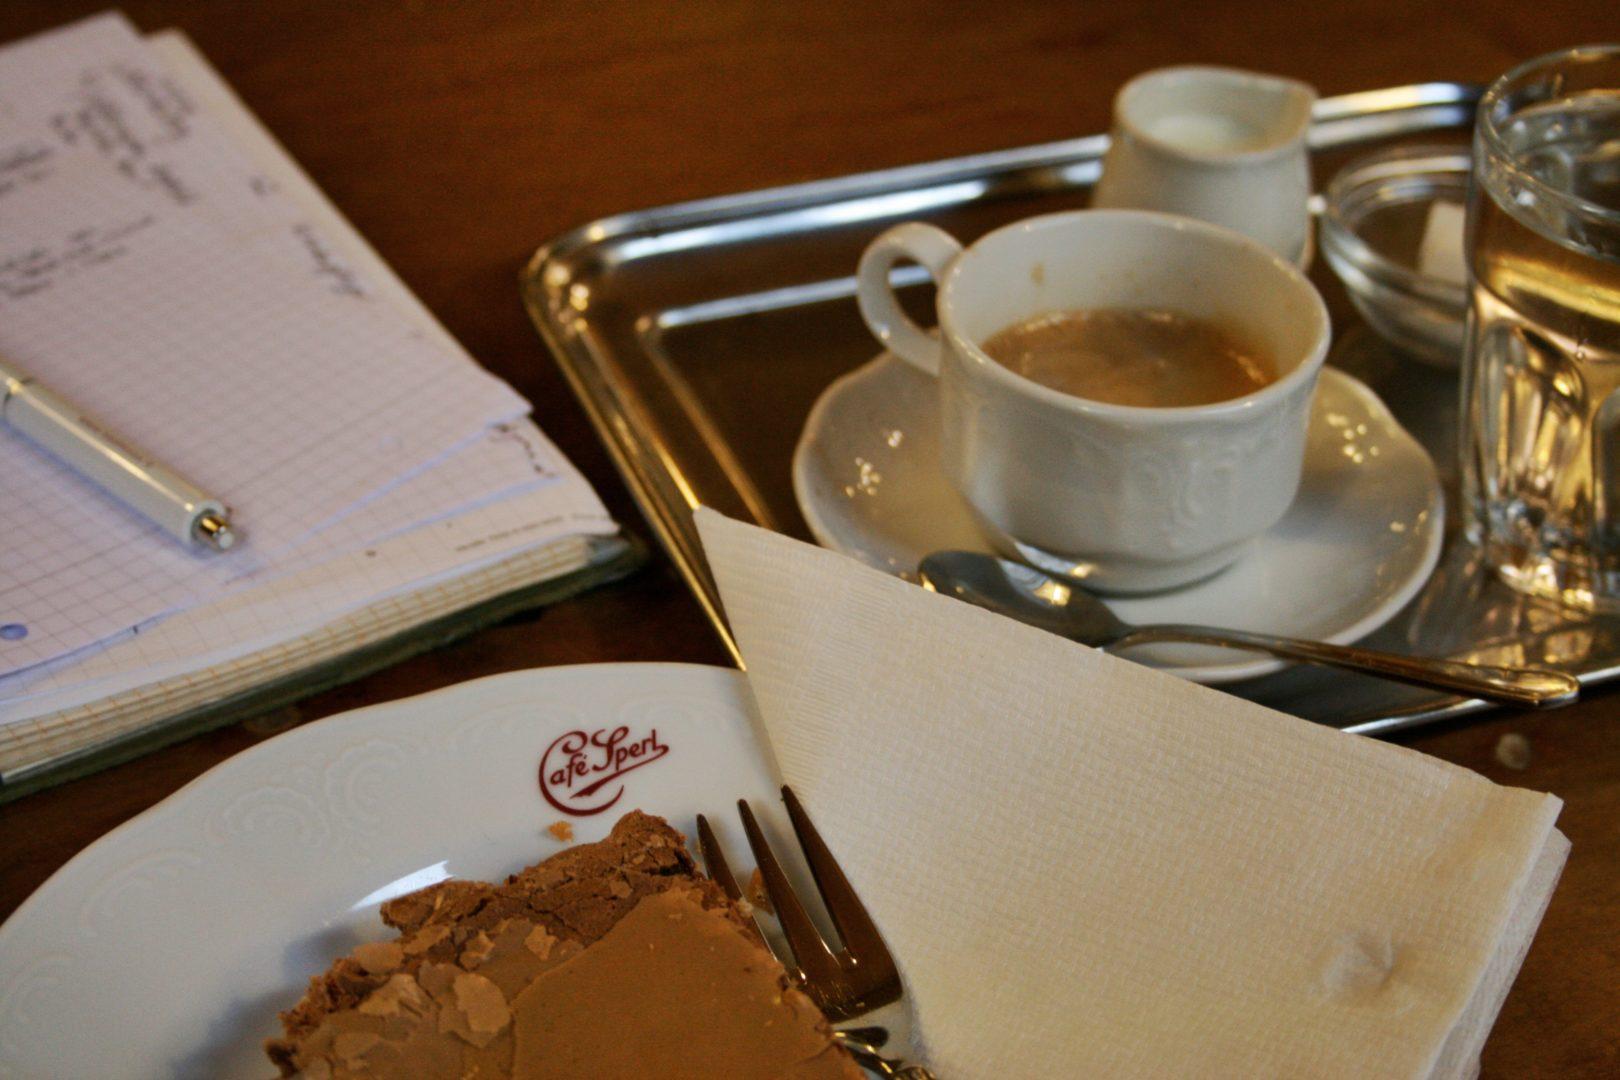 Cafe_Sperl_Kuchen